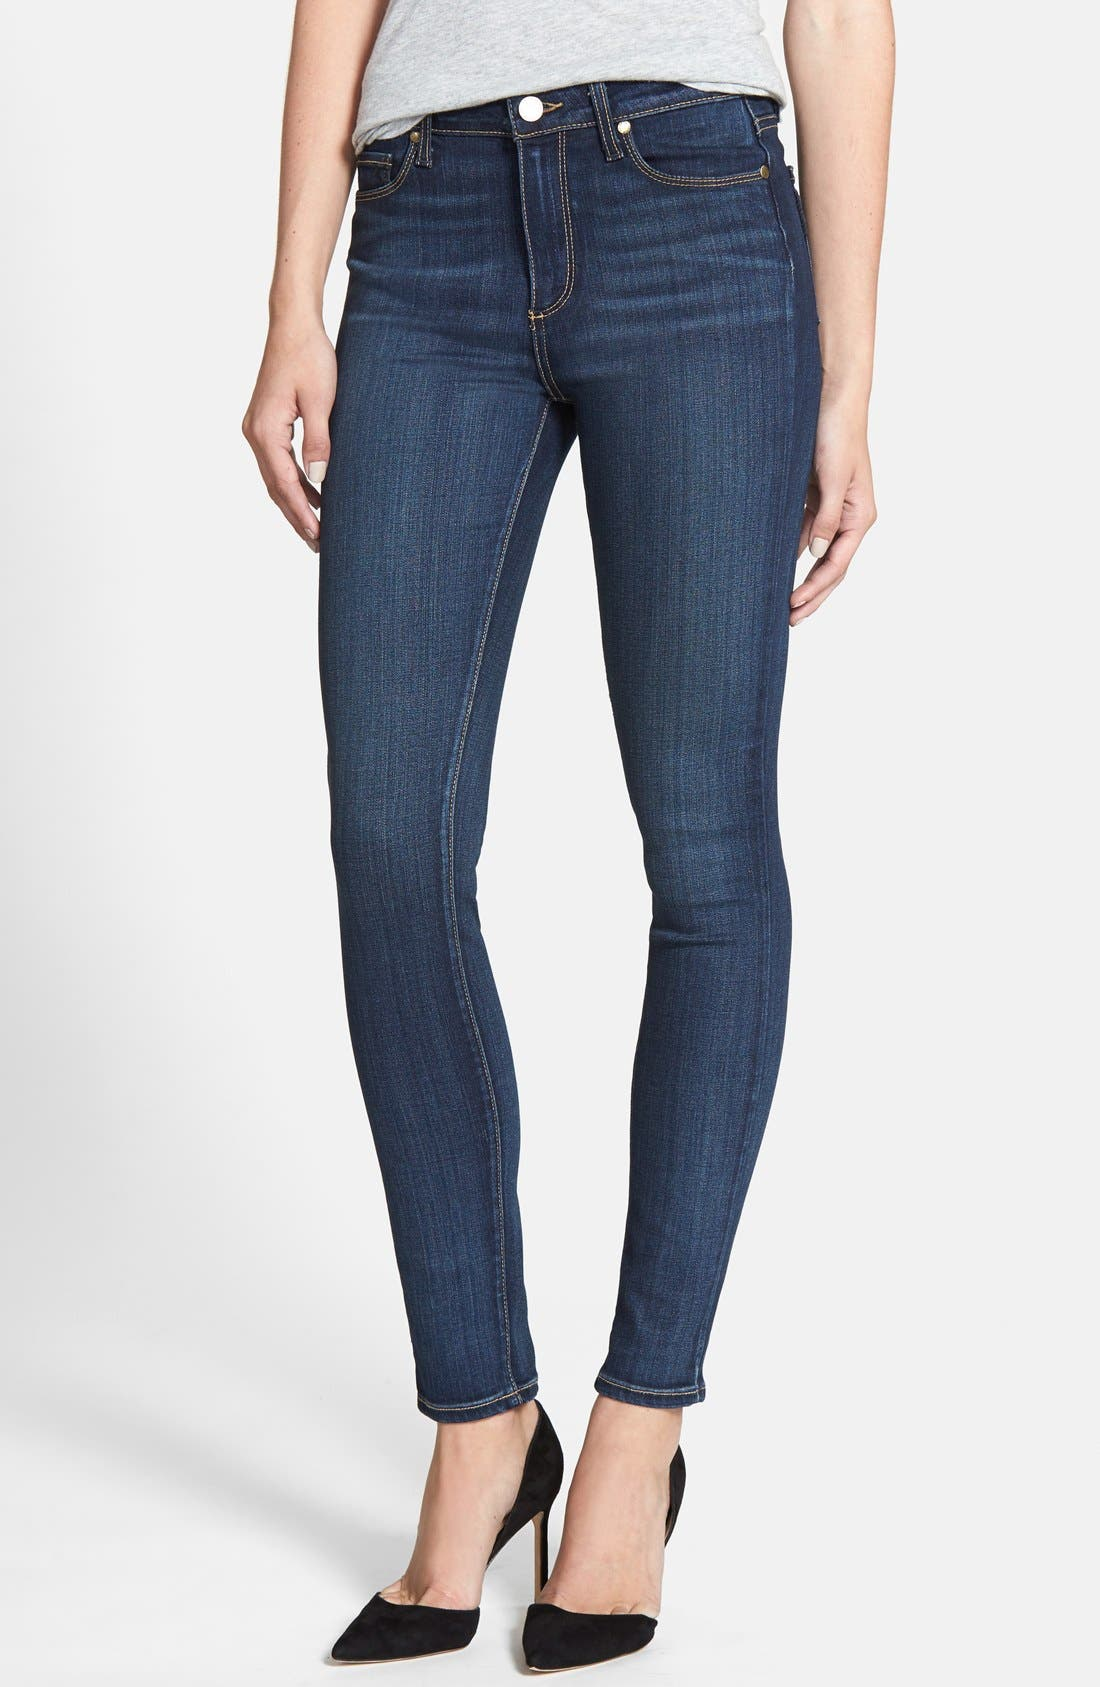 PAIGE Transcend - Hoxton High Waist Skinny Jeans